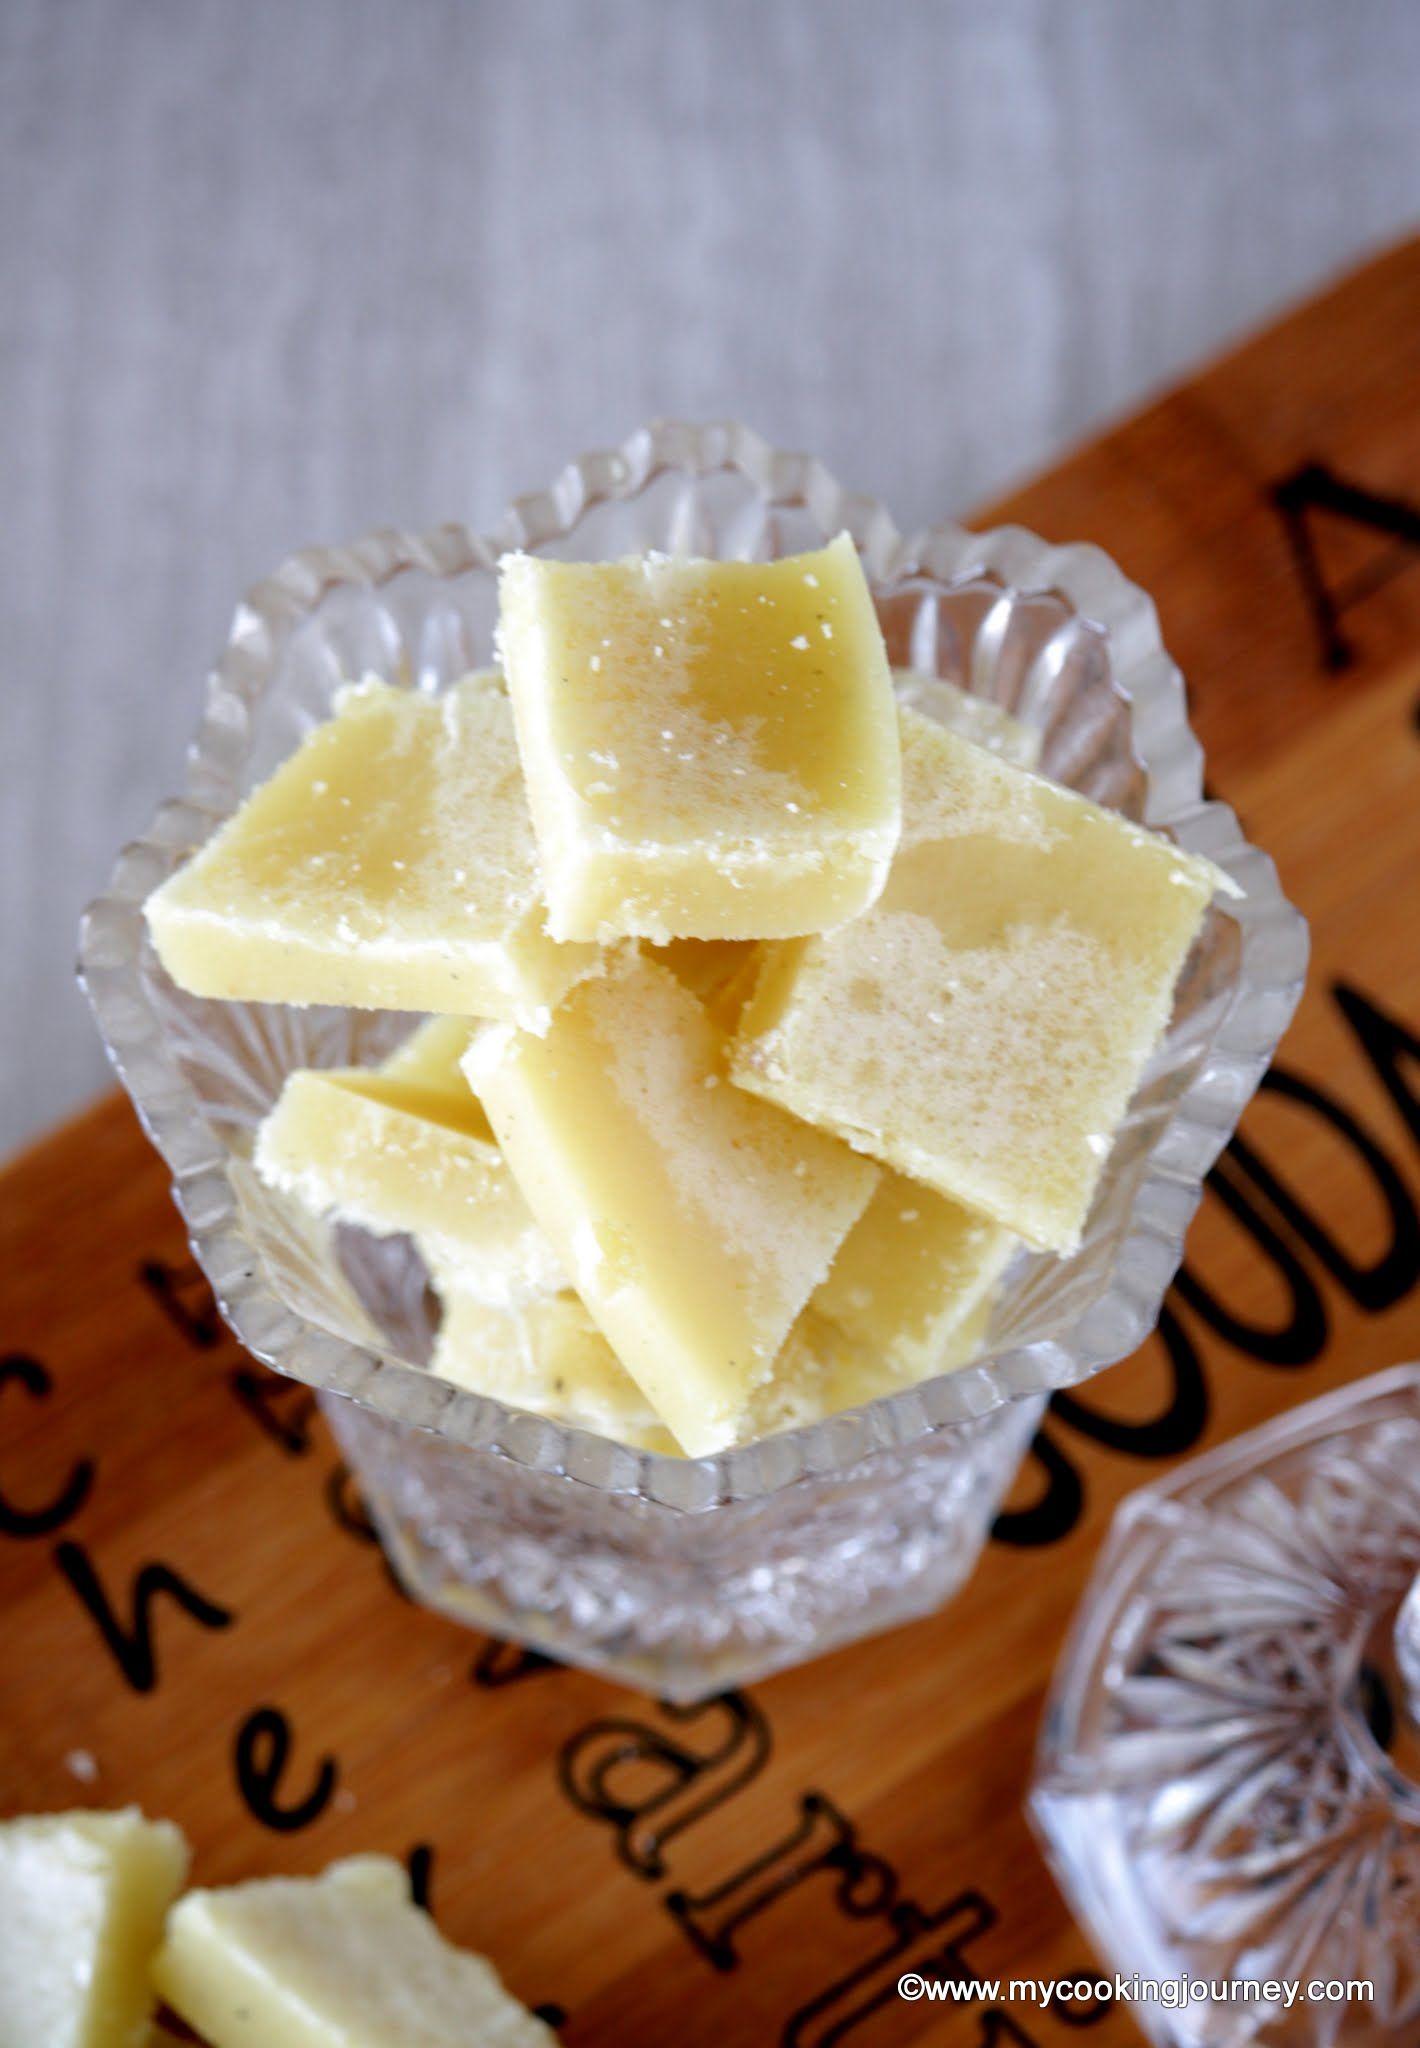 My Cooking Journey: I for Inji Marappa – Inji Murappa - Inji Mittai - Candied Ginger – Ginger Candy